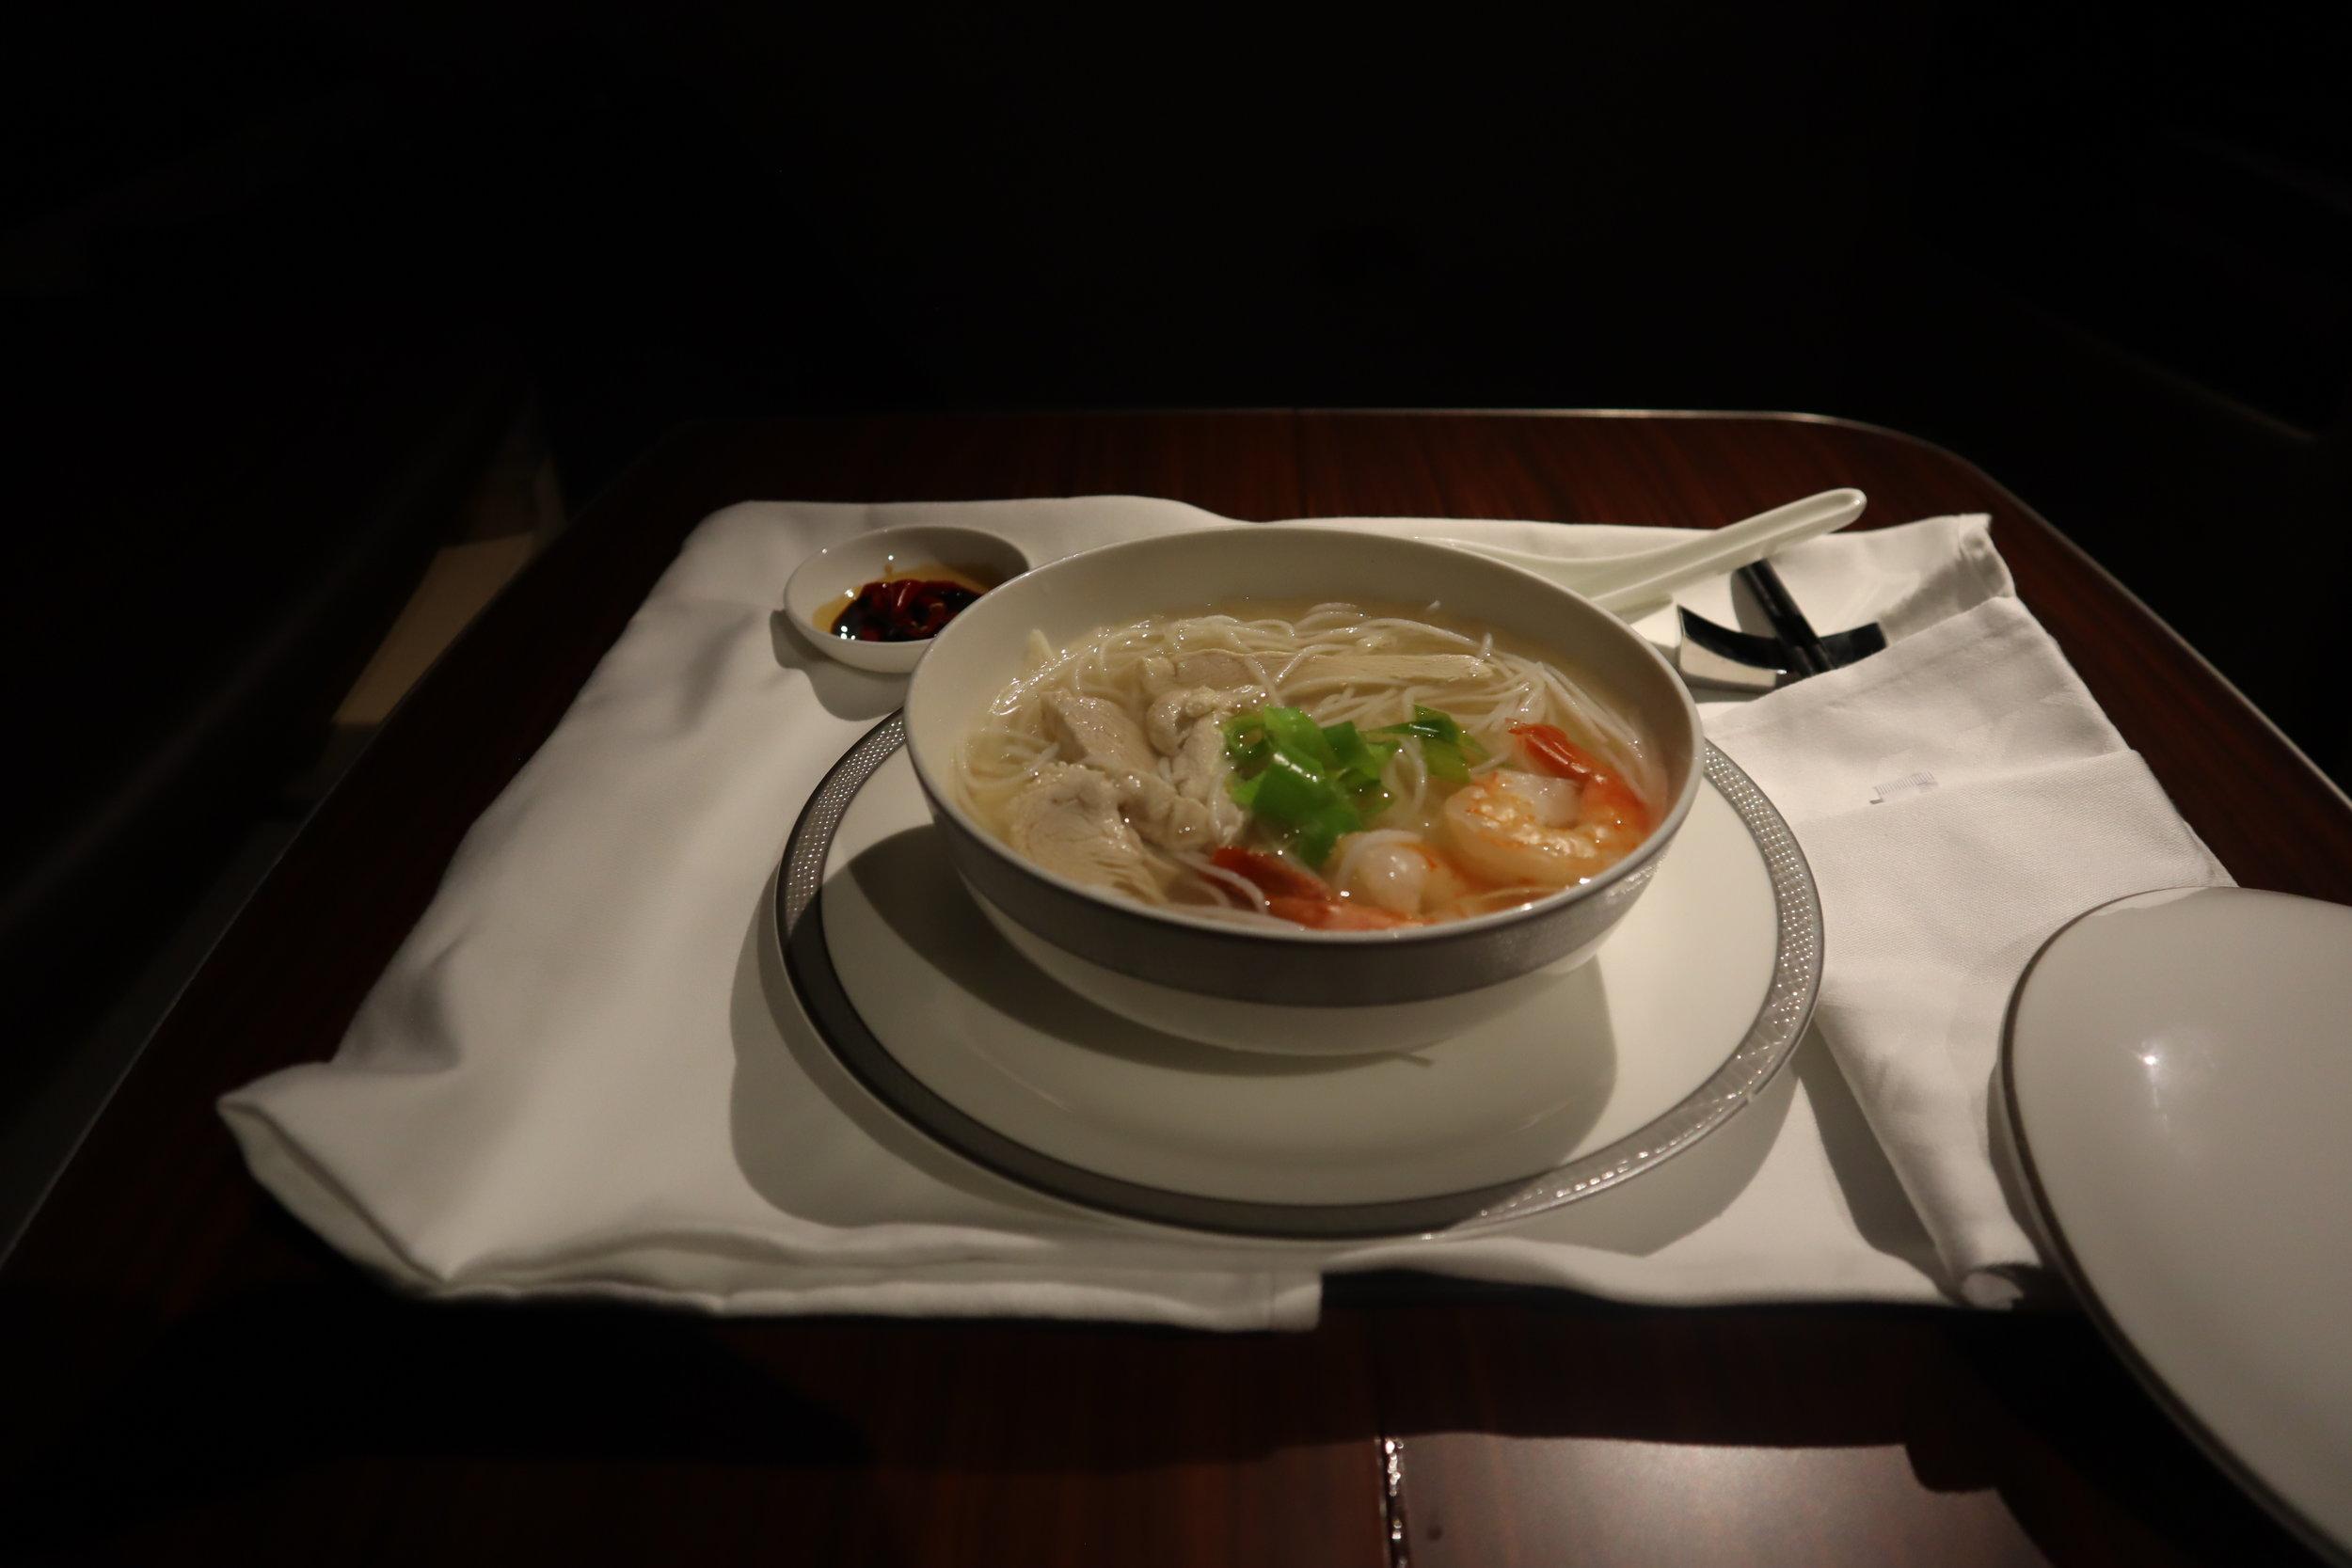 Singapore Airlines Suites Class – Bee Hoon noodles